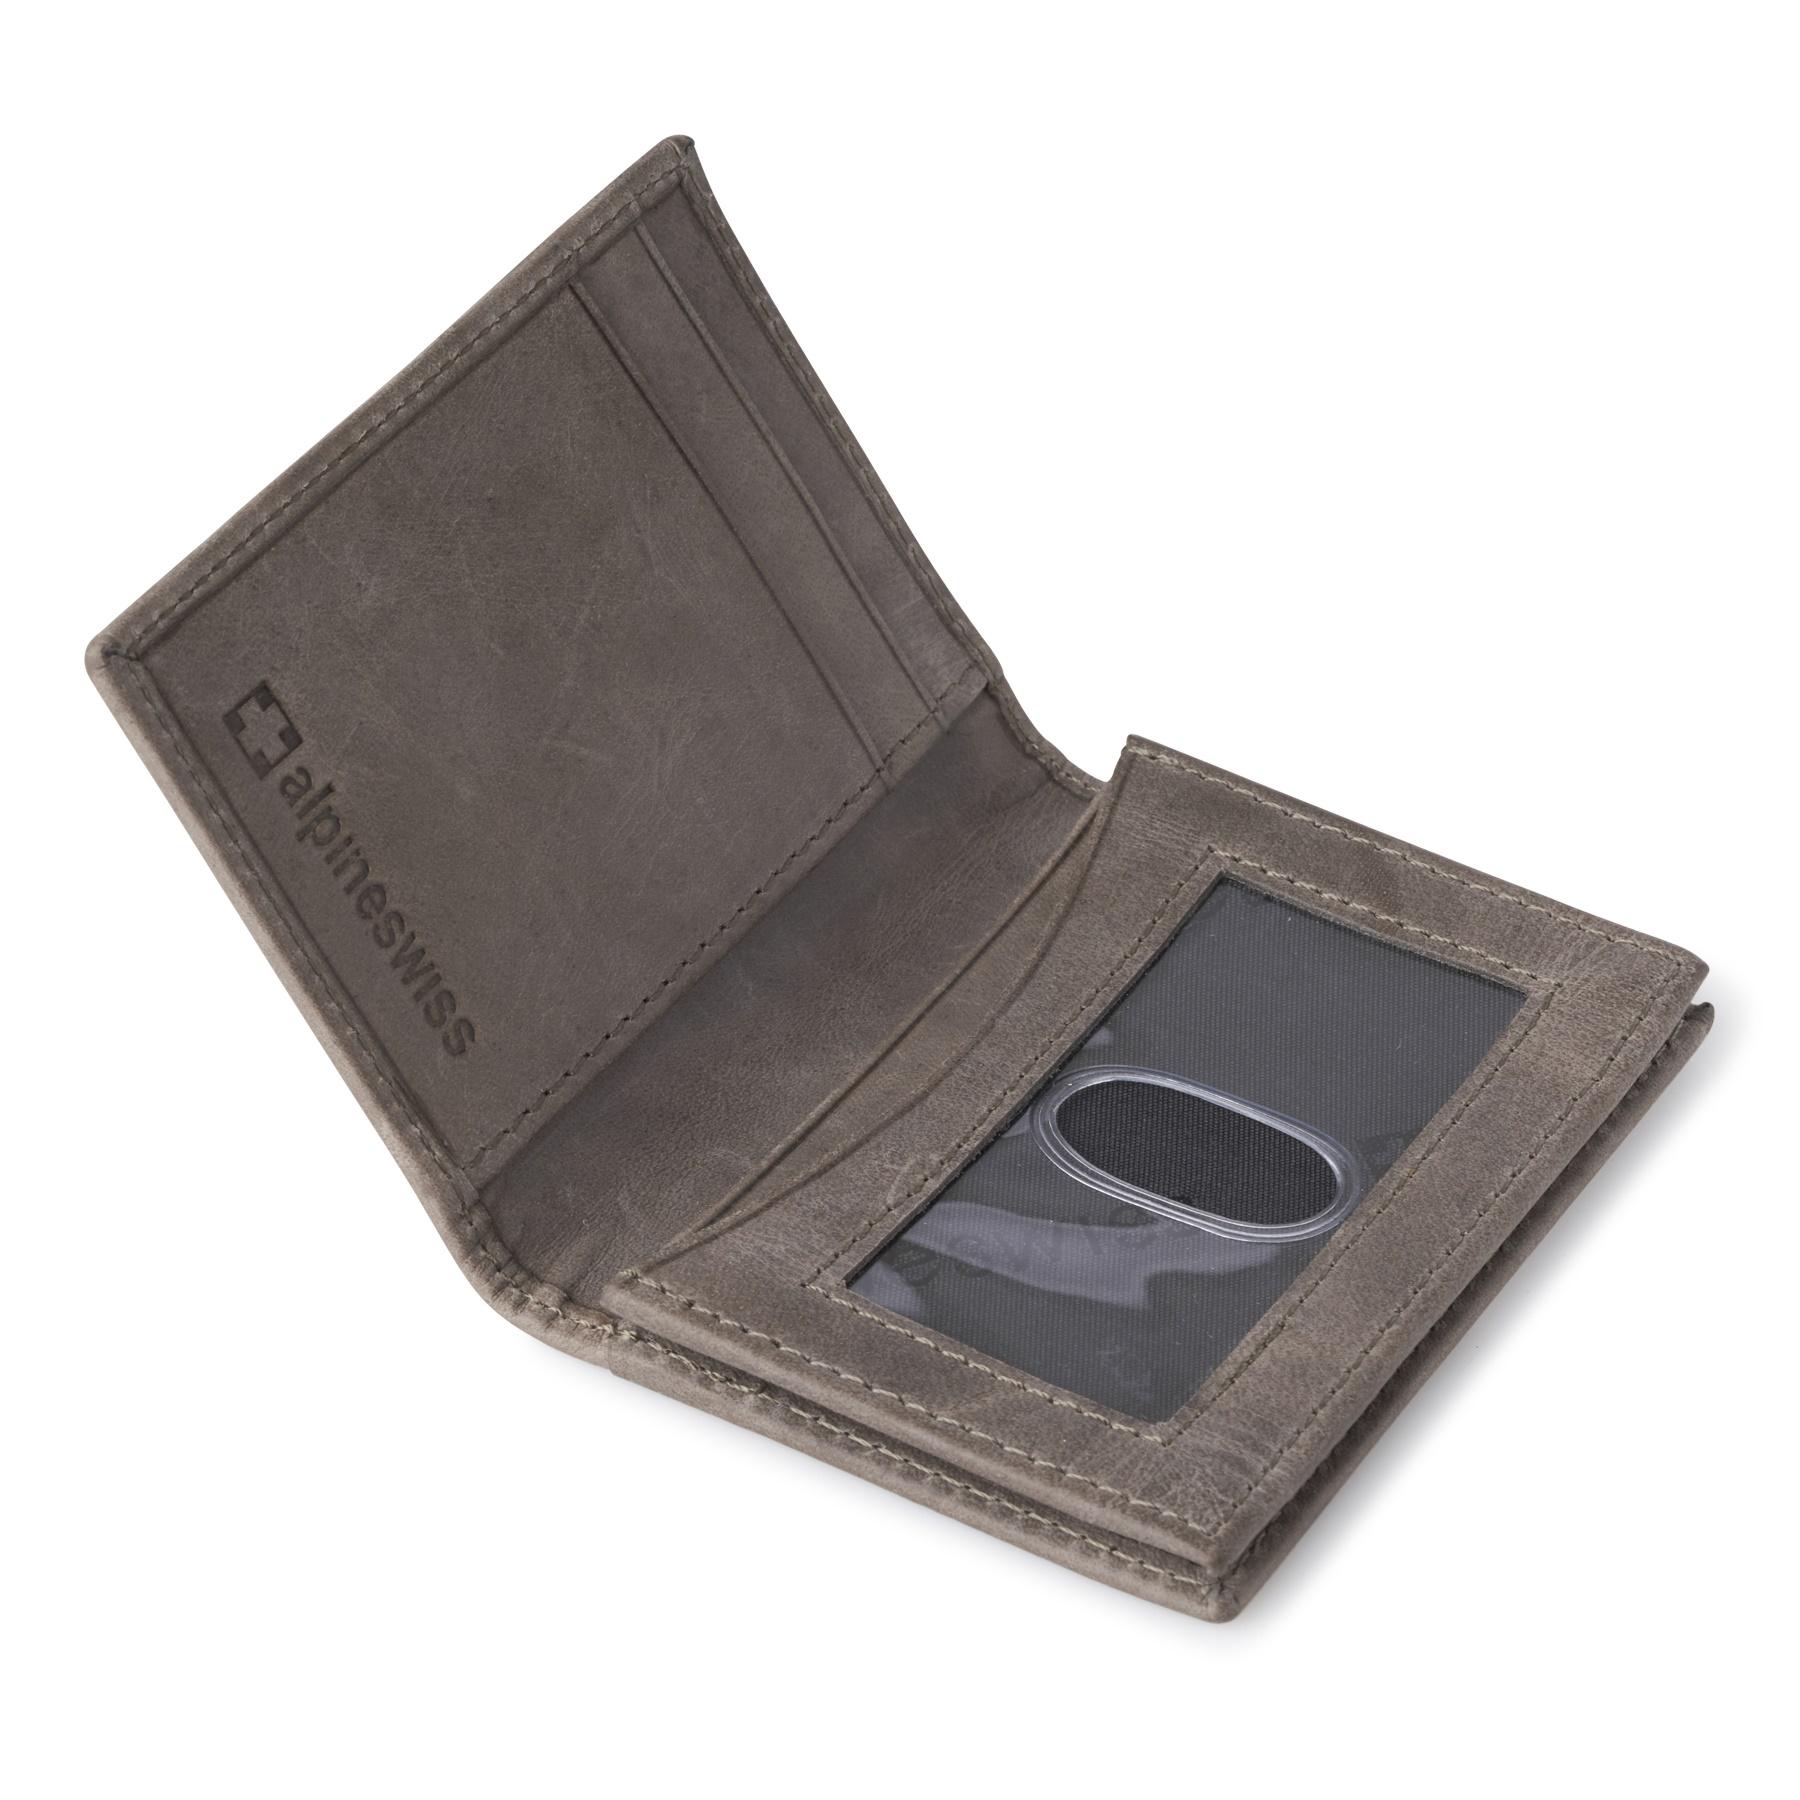 Alpine-Swiss-RFID-Leather-Business-Card-Wallet-Minimalist-ID-Window-Card-Holder thumbnail 42